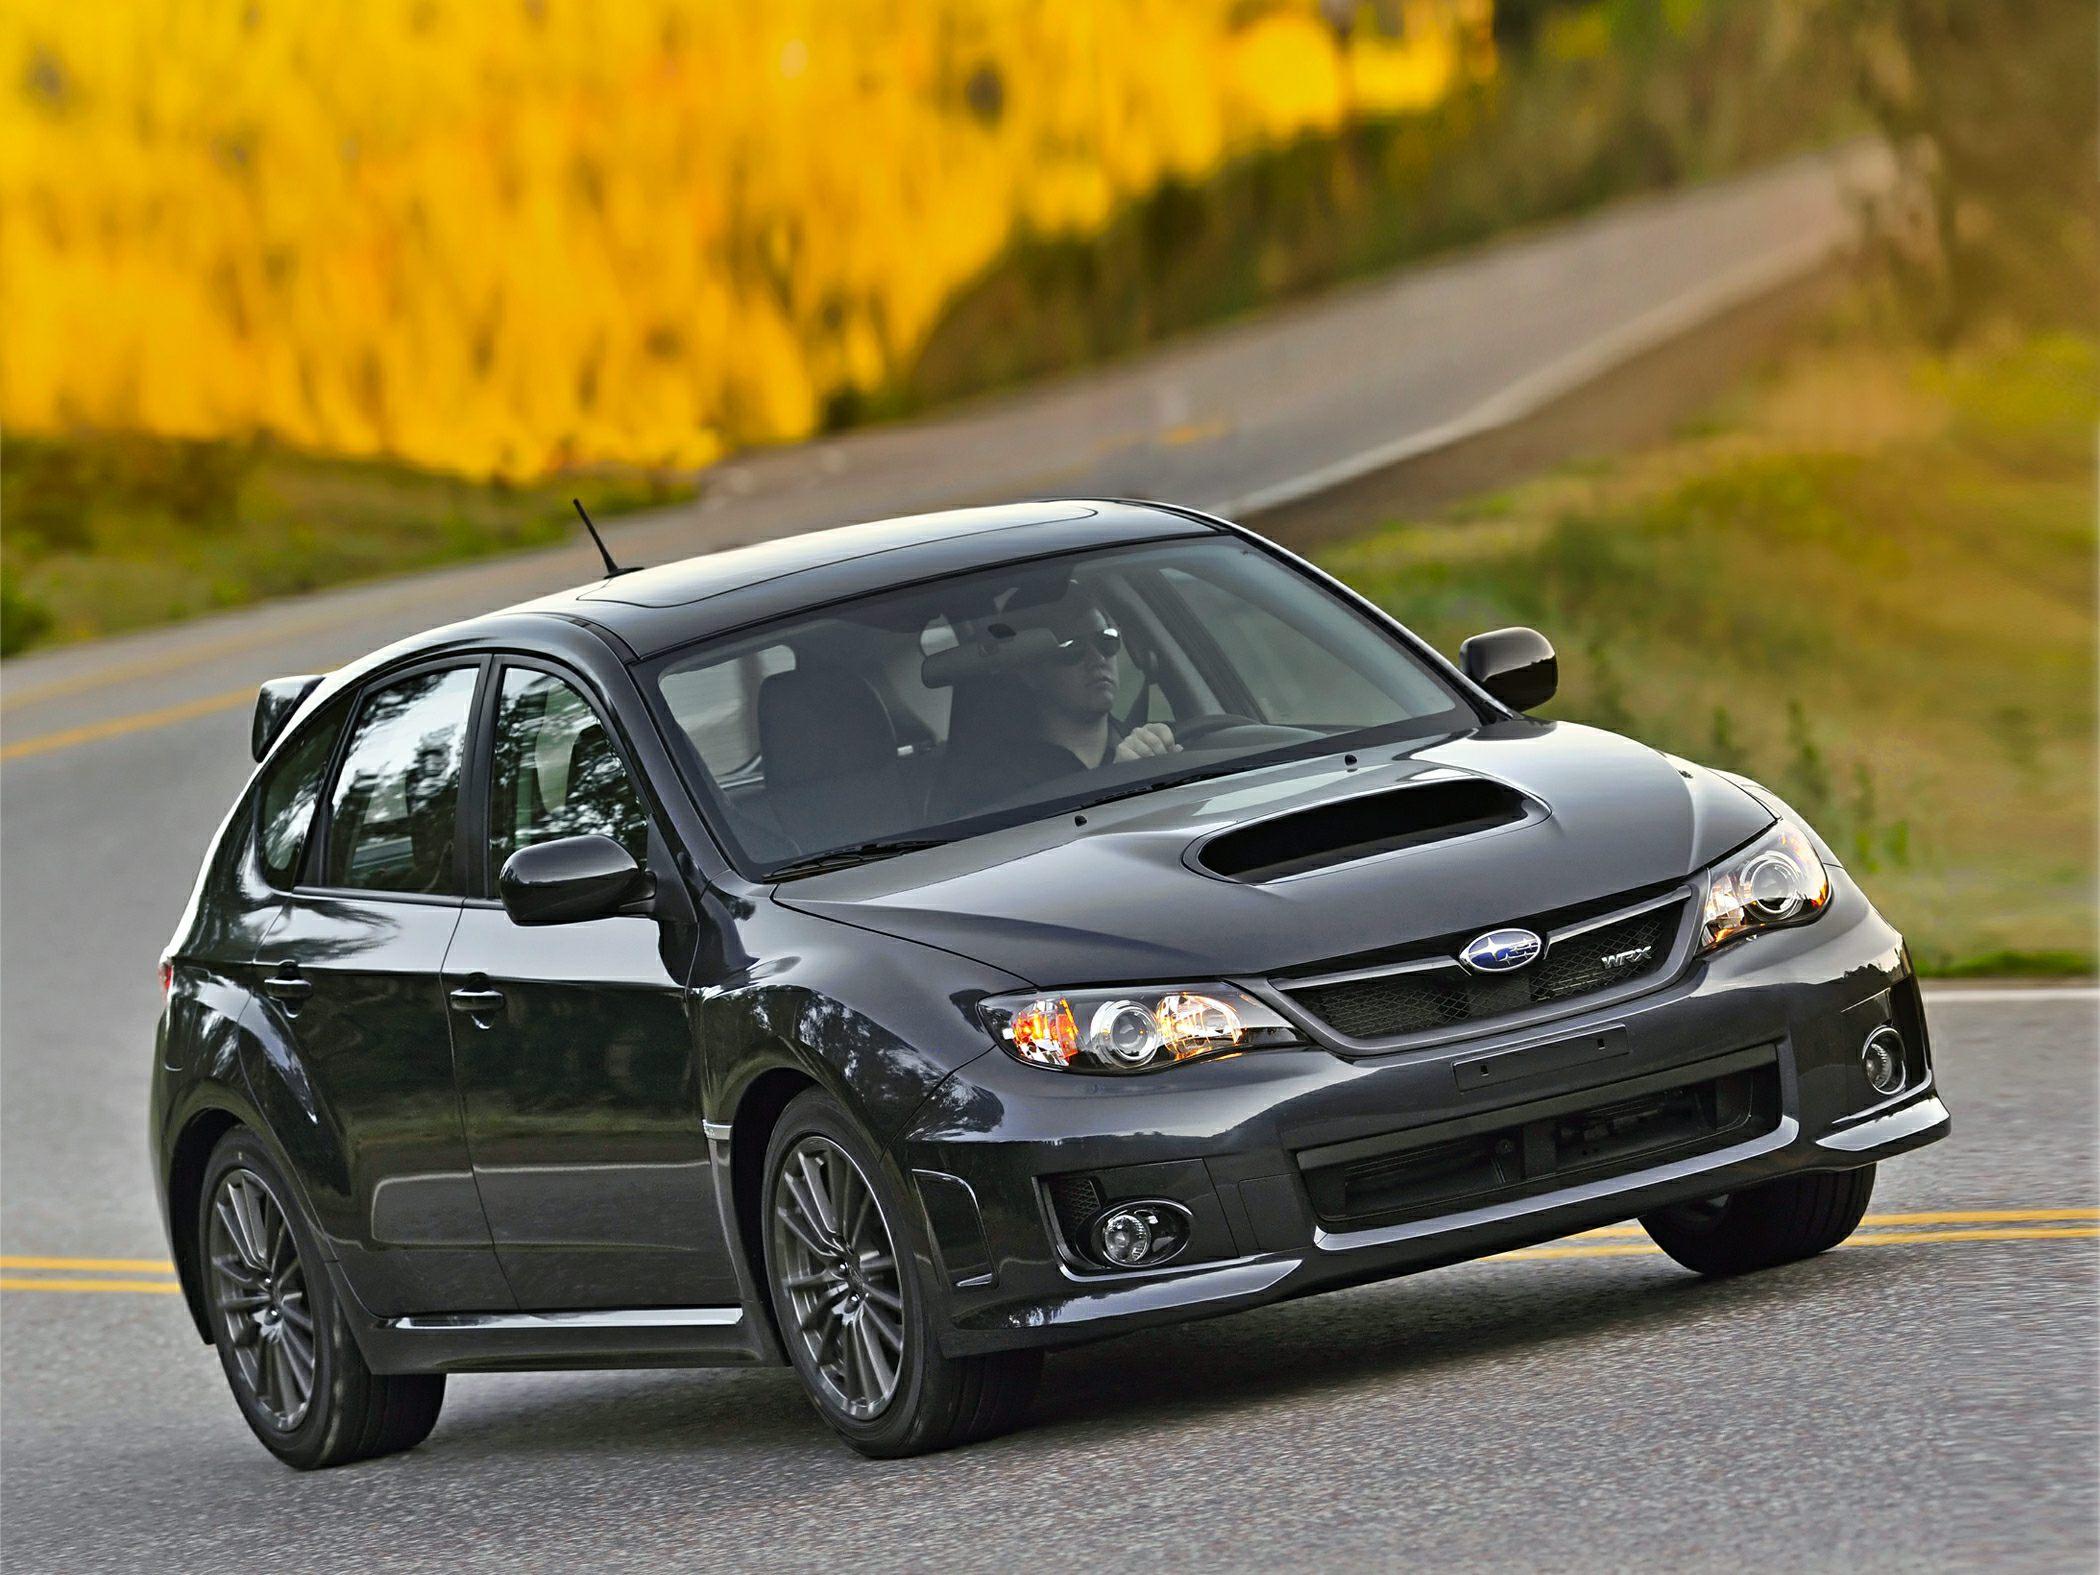 2014 Subaru Impreza Wrx Image 16